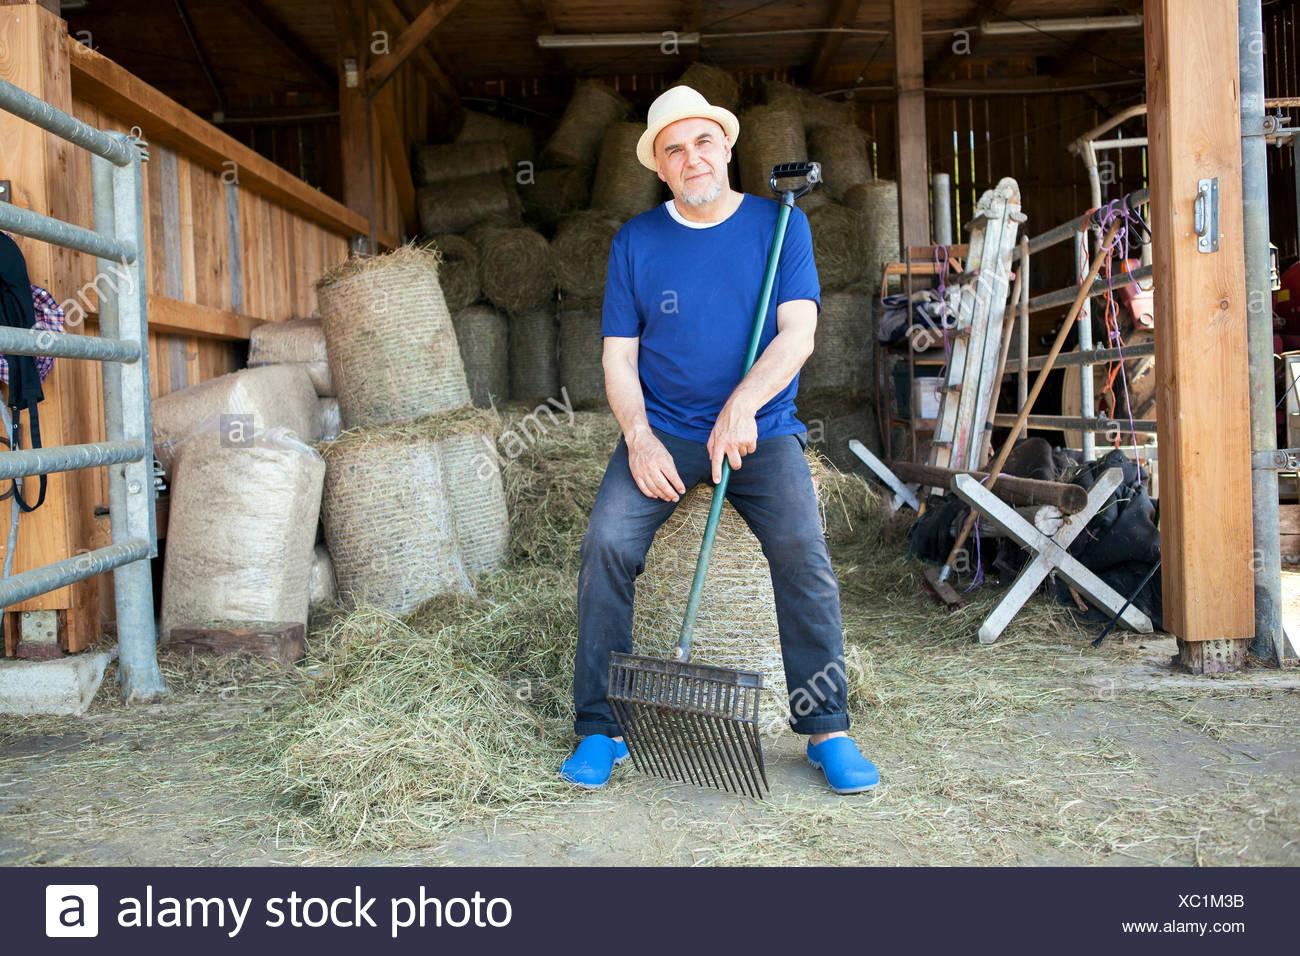 Senior man in stable taking a break - Stock Image